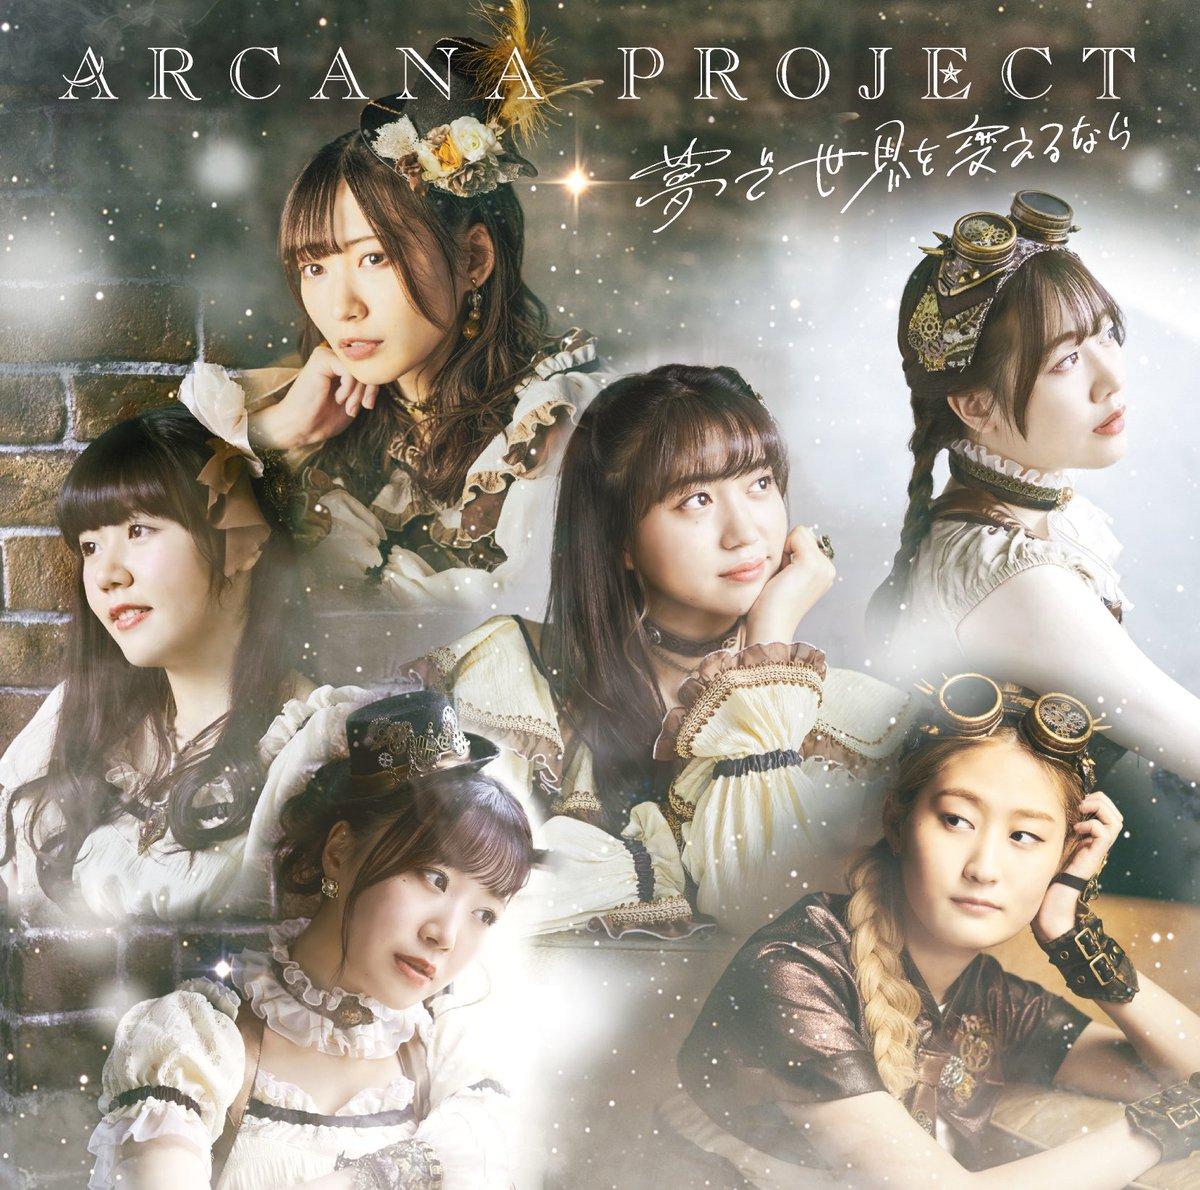 『ARCANA PROJECT - 夢で世界を変えるなら』収録の『夢で世界を変えるなら』ジャケット